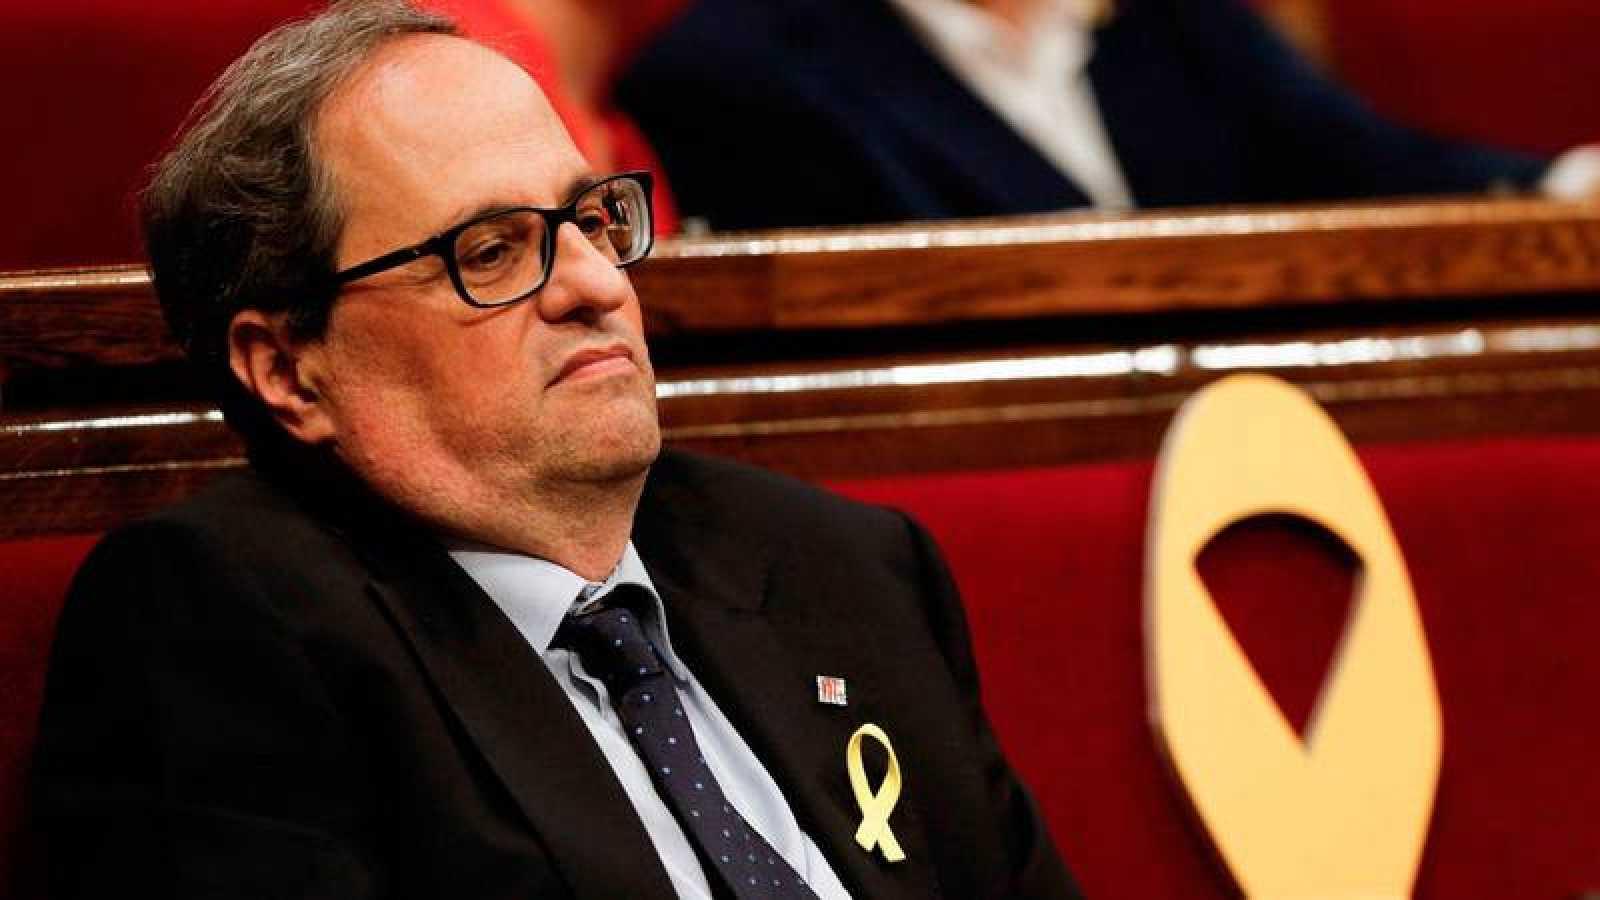 El Parlament escenifica las grietas del separatismo